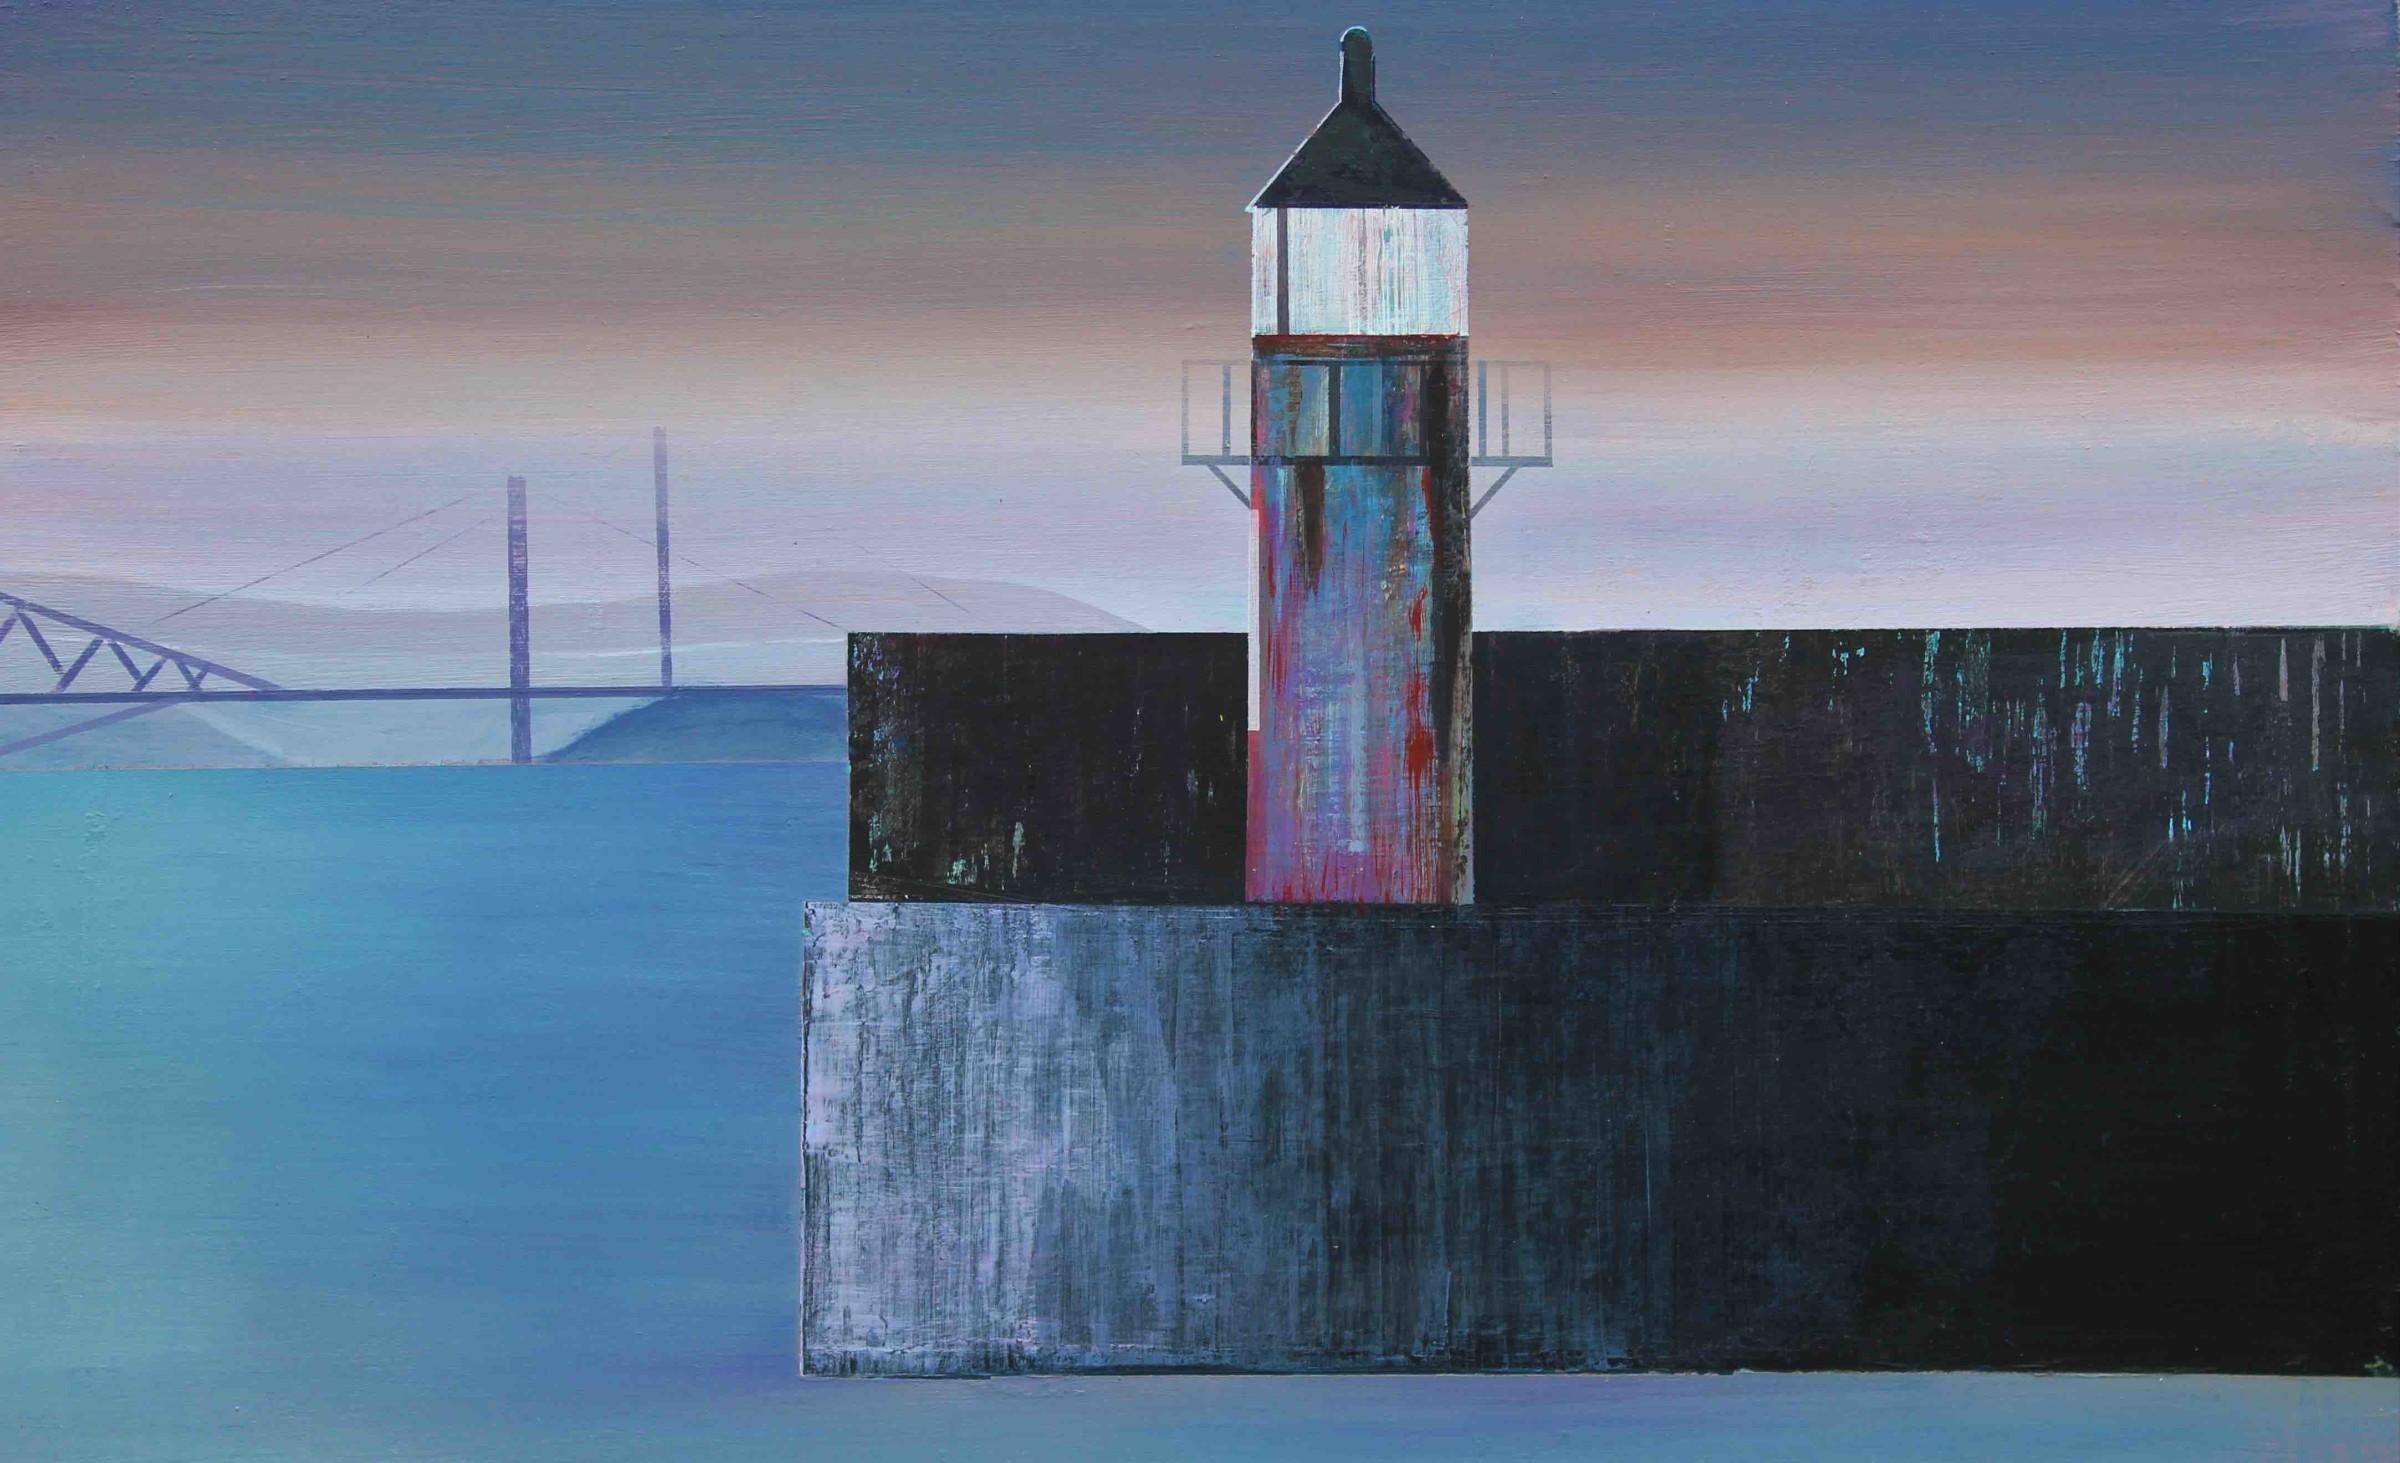 <span class=&#34;link fancybox-details-link&#34;><a href=&#34;/artists/184-euan-mcgregor/works/2712-euan-mcgregor-lighthouse-and-the-forth-bridges/&#34;>View Detail Page</a></span><div class=&#34;artist&#34;><strong>Euan McGregor</strong></div> <div class=&#34;title&#34;><em>Lighthouse and the Forth Bridges</em></div> <div class=&#34;medium&#34;>Acrylic on Board</div> <div class=&#34;dimensions&#34;>37 x 59 cm </div><div class=&#34;price&#34;>£1,800.00</div>